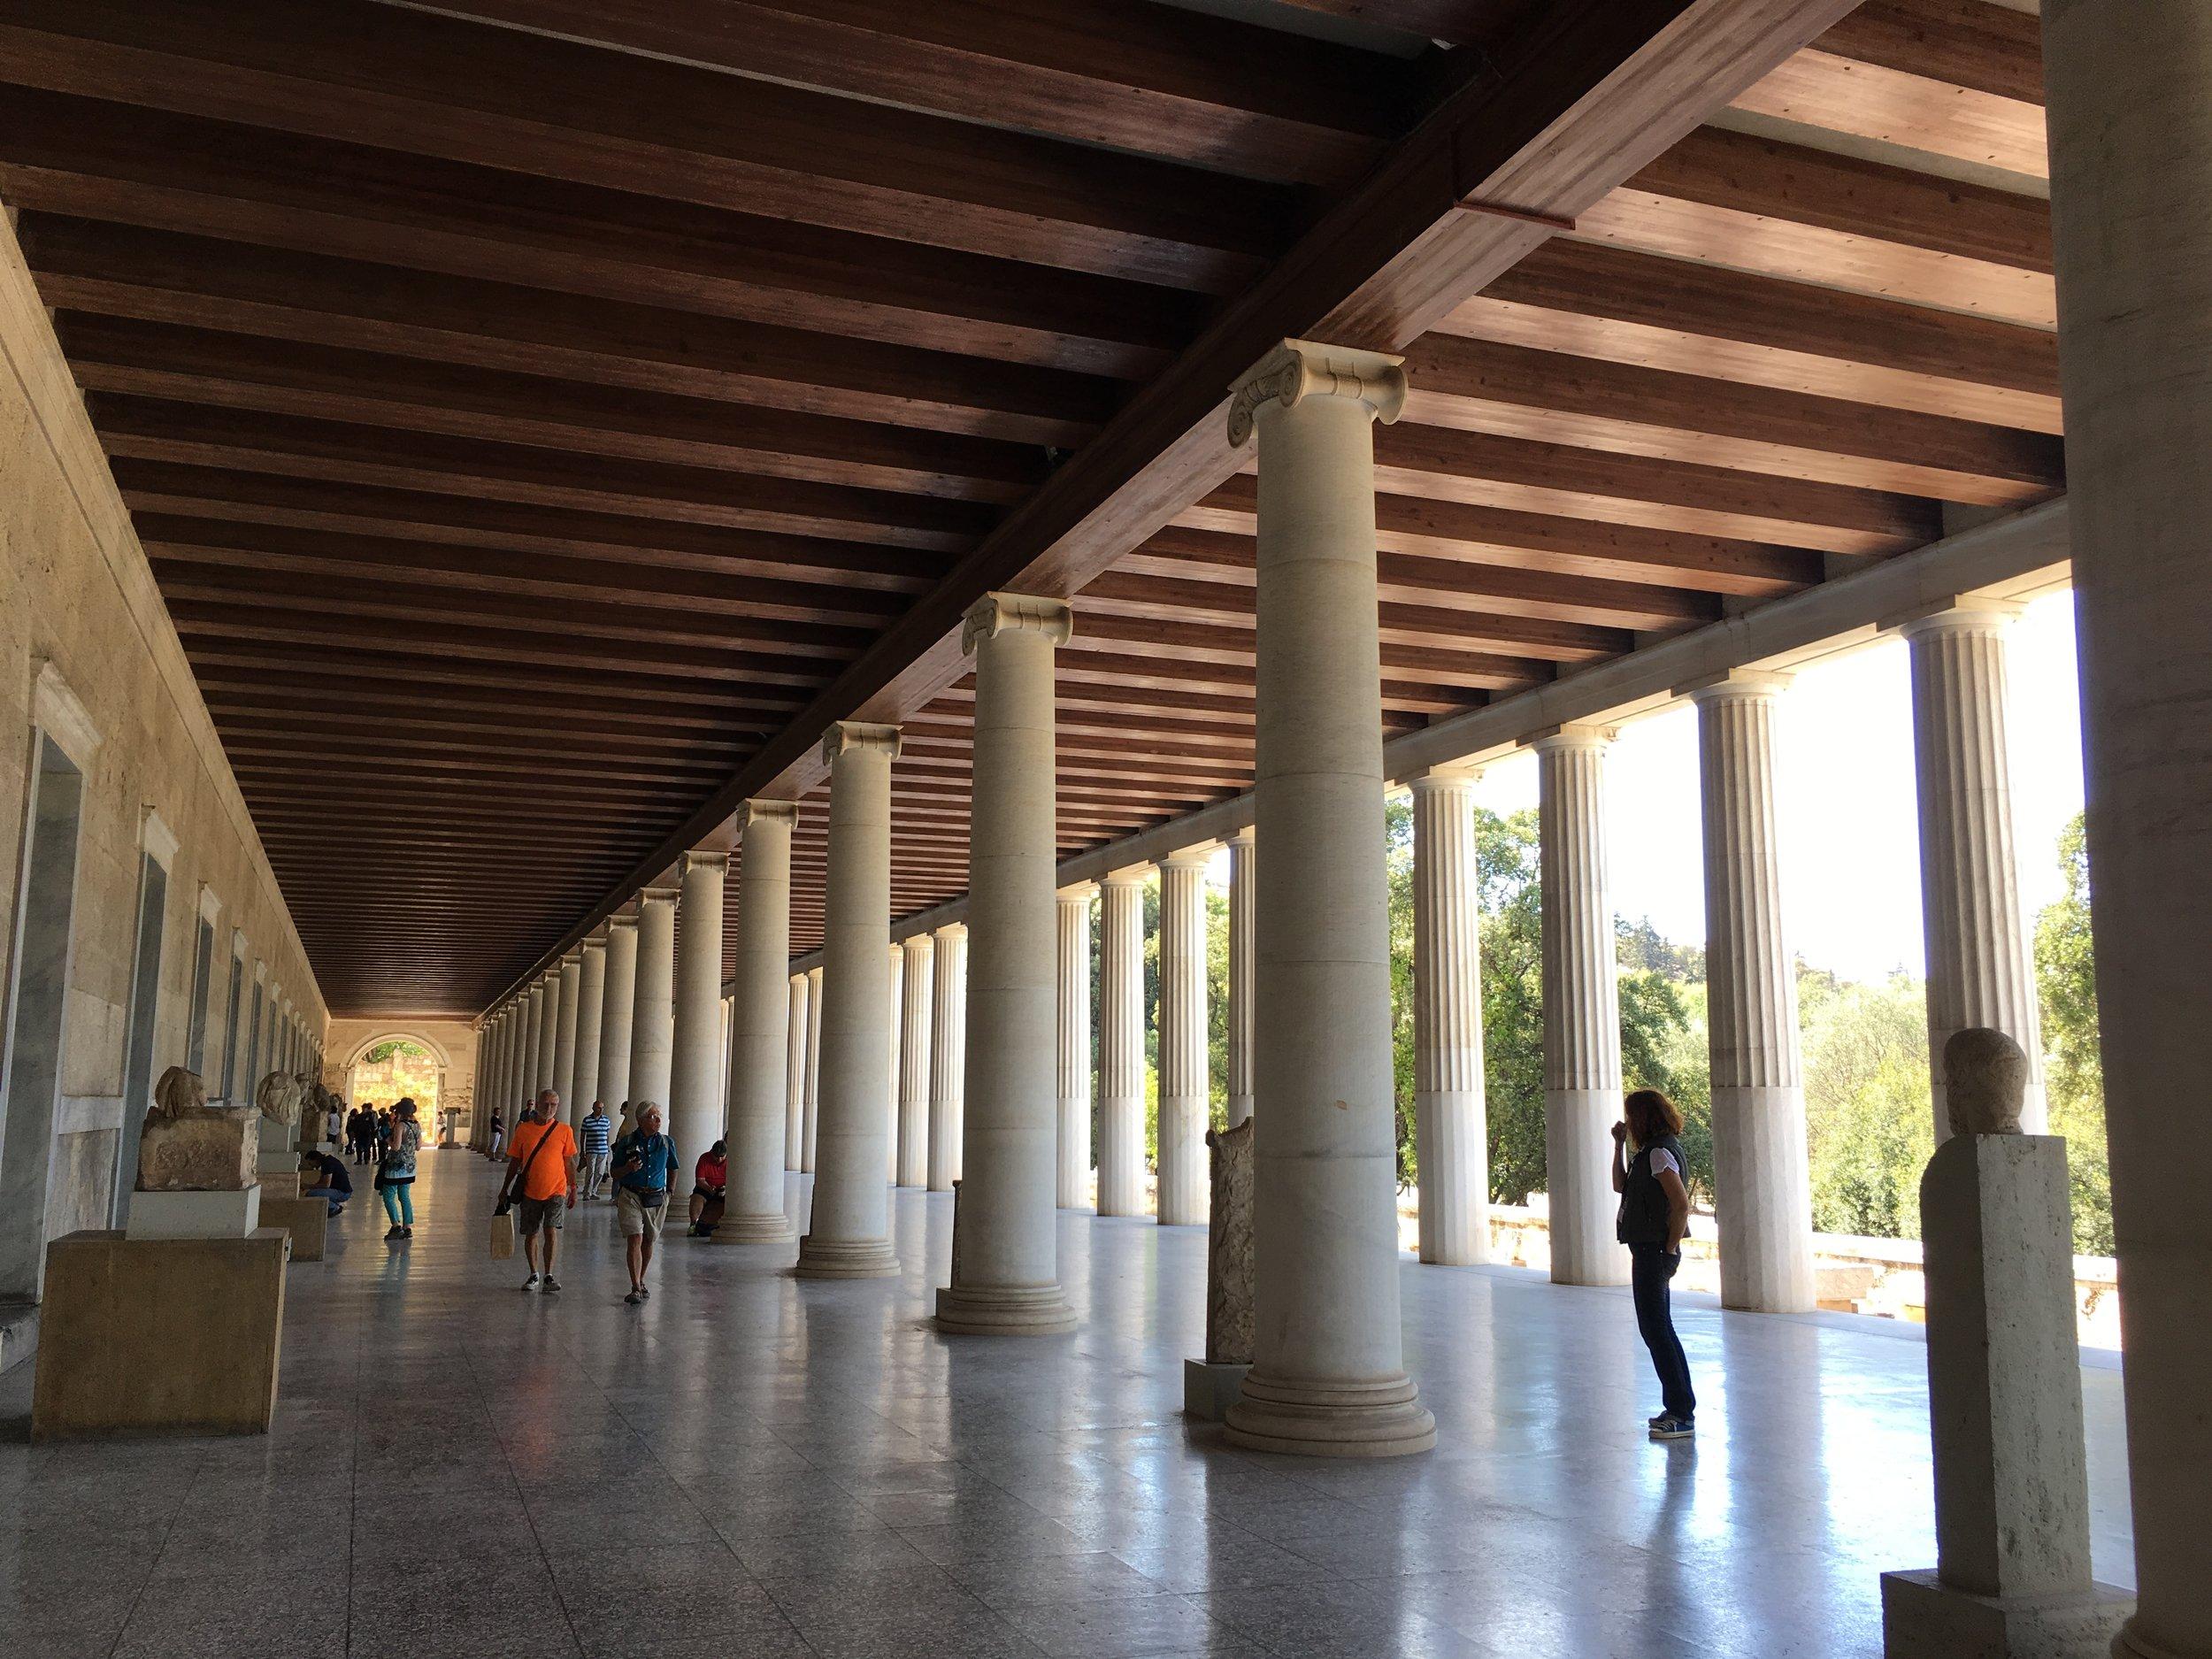 Where democracy thrived, at Ancient Agora of Athens